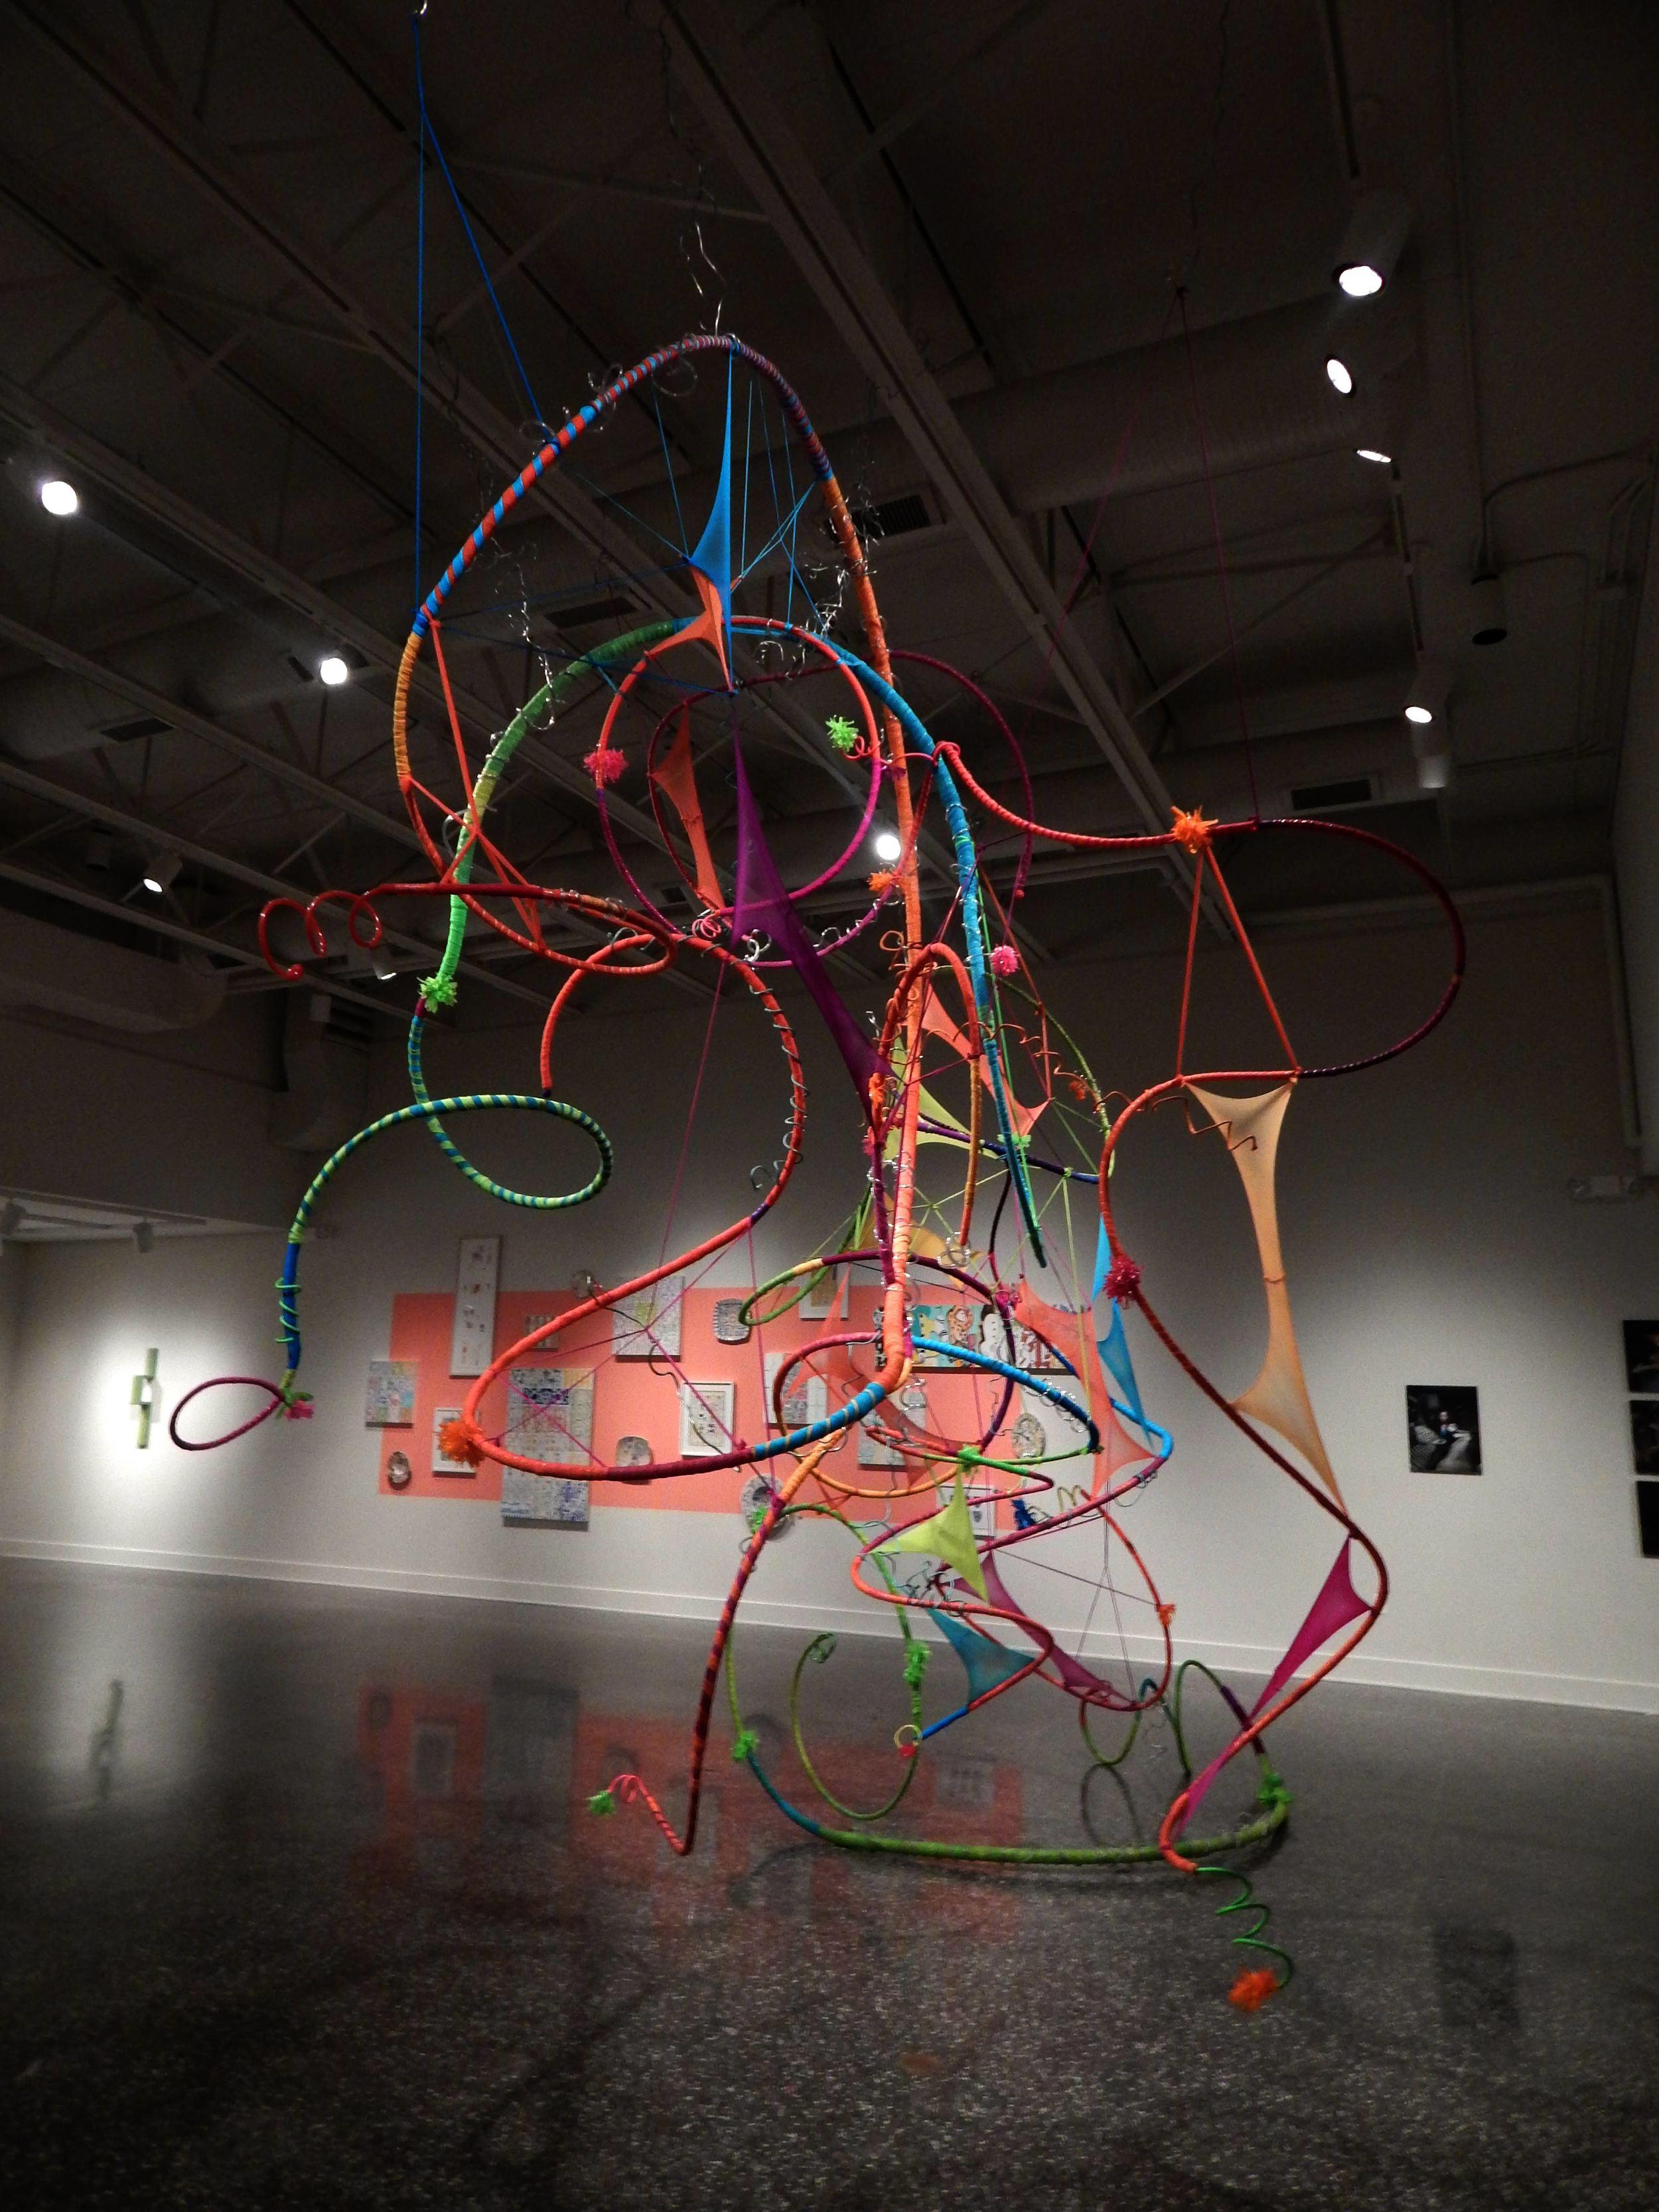 Judy Thomas, 'Expansion', 2014